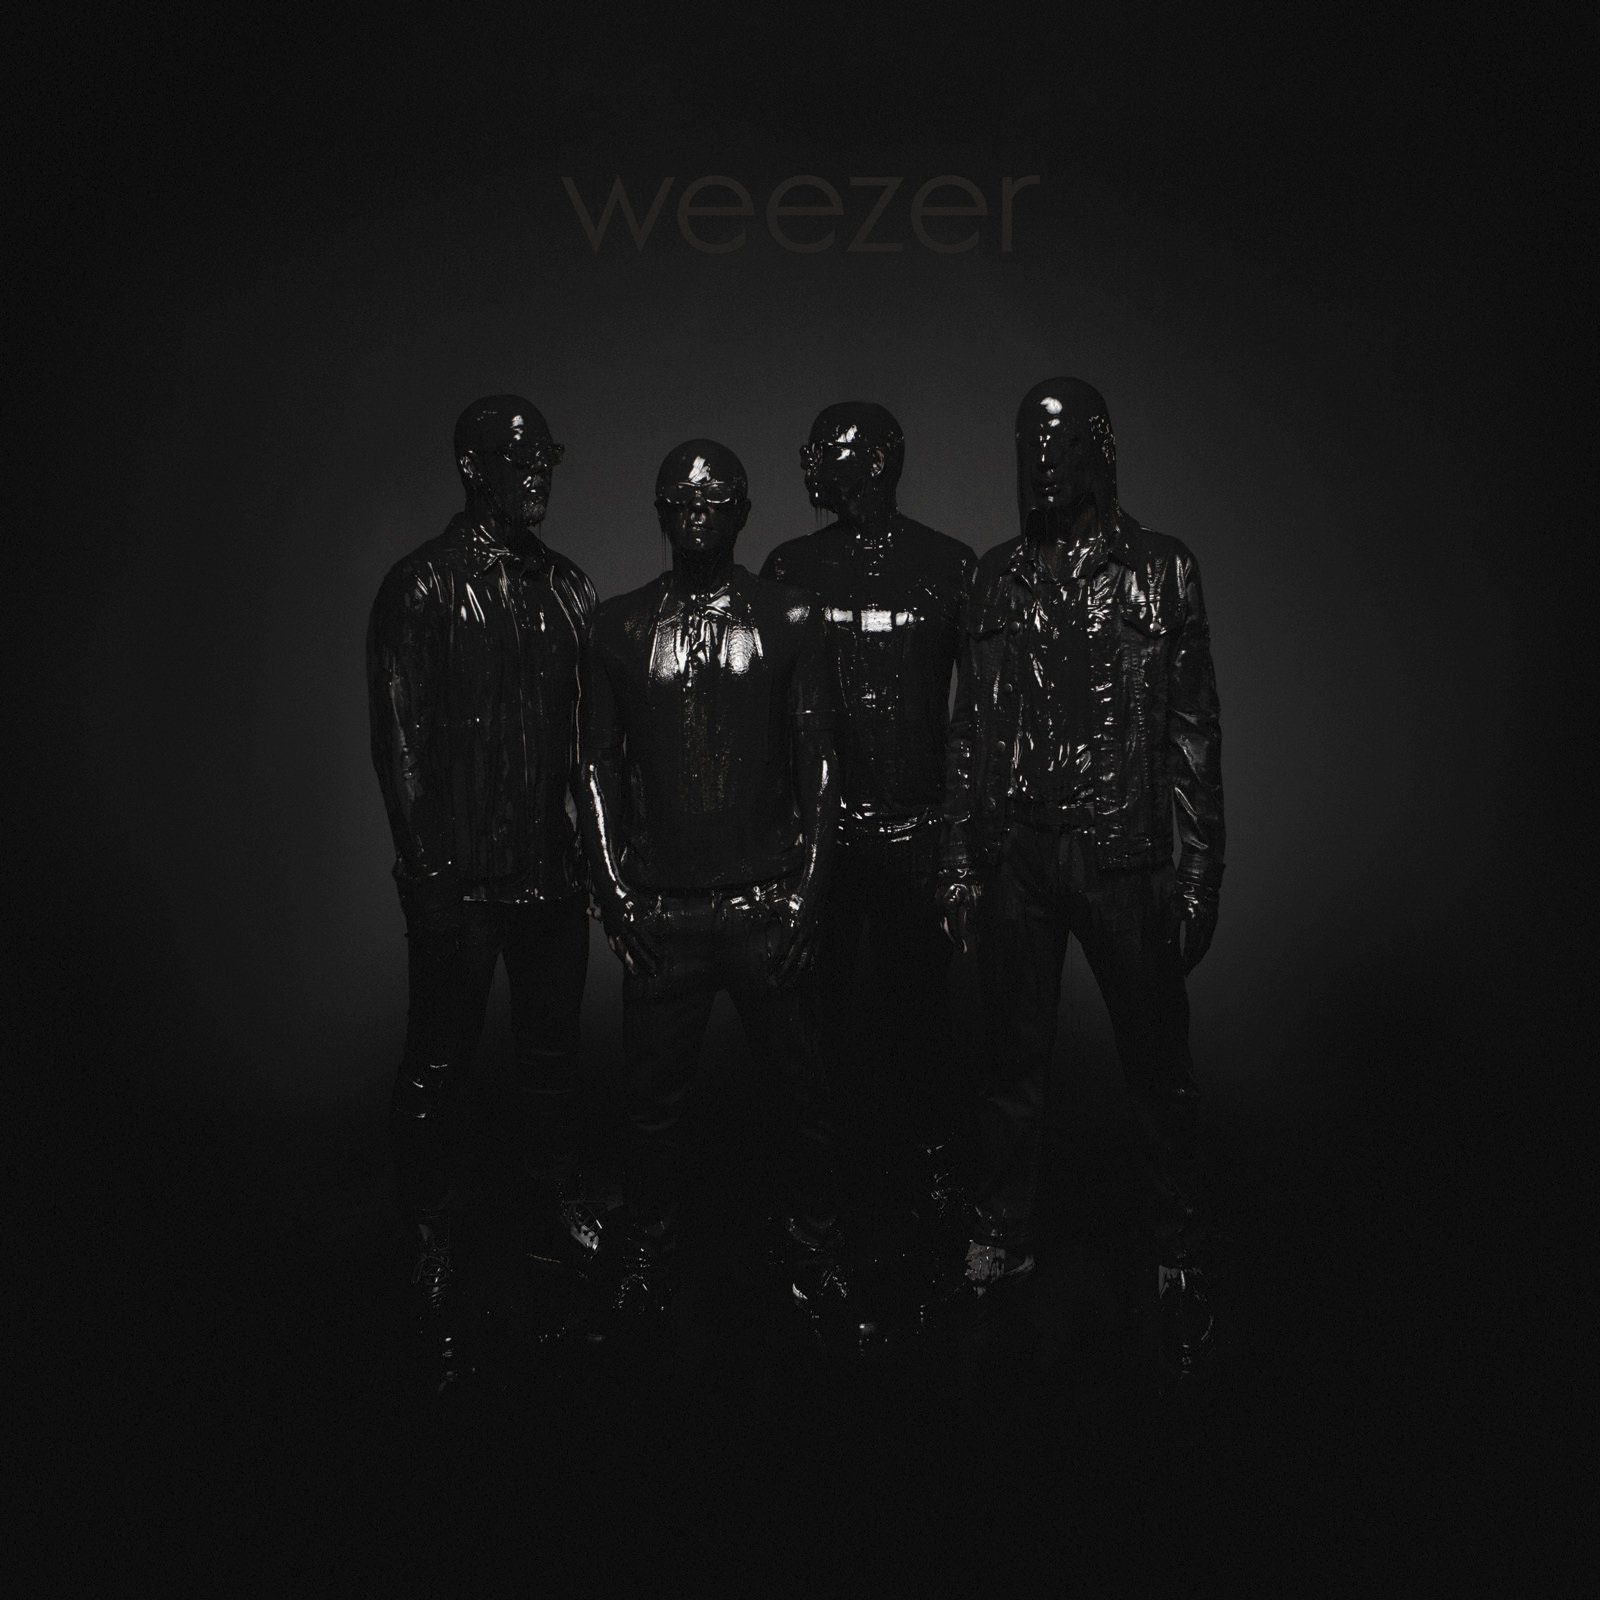 Review: Weezer's 'Black Album' mocks, shocks and knocks